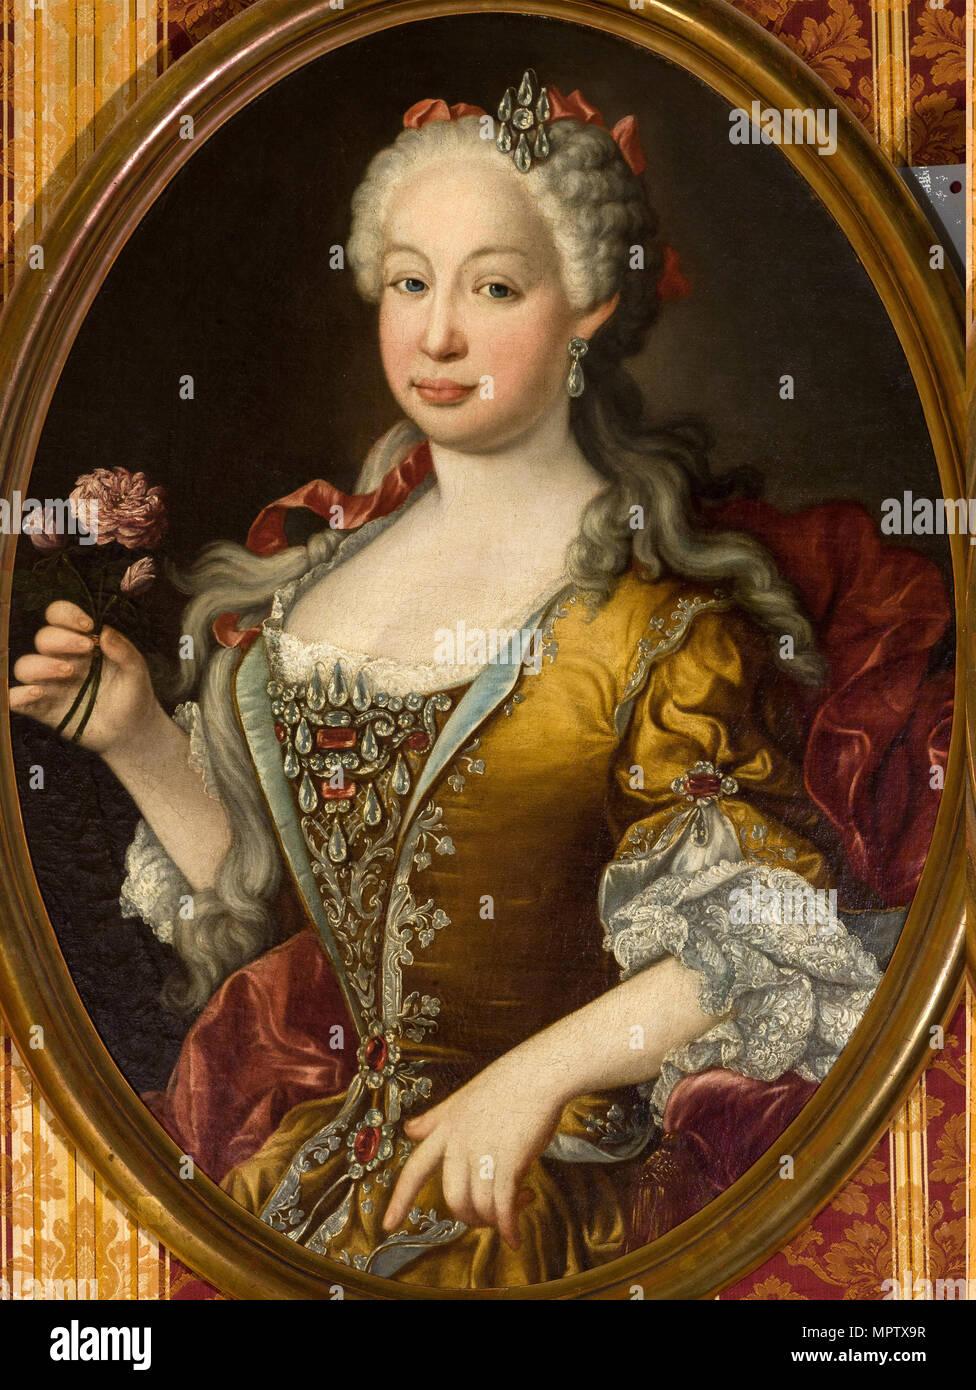 Portrait of Infanta Barbara of Portugal (1711-1758). - Stock Image